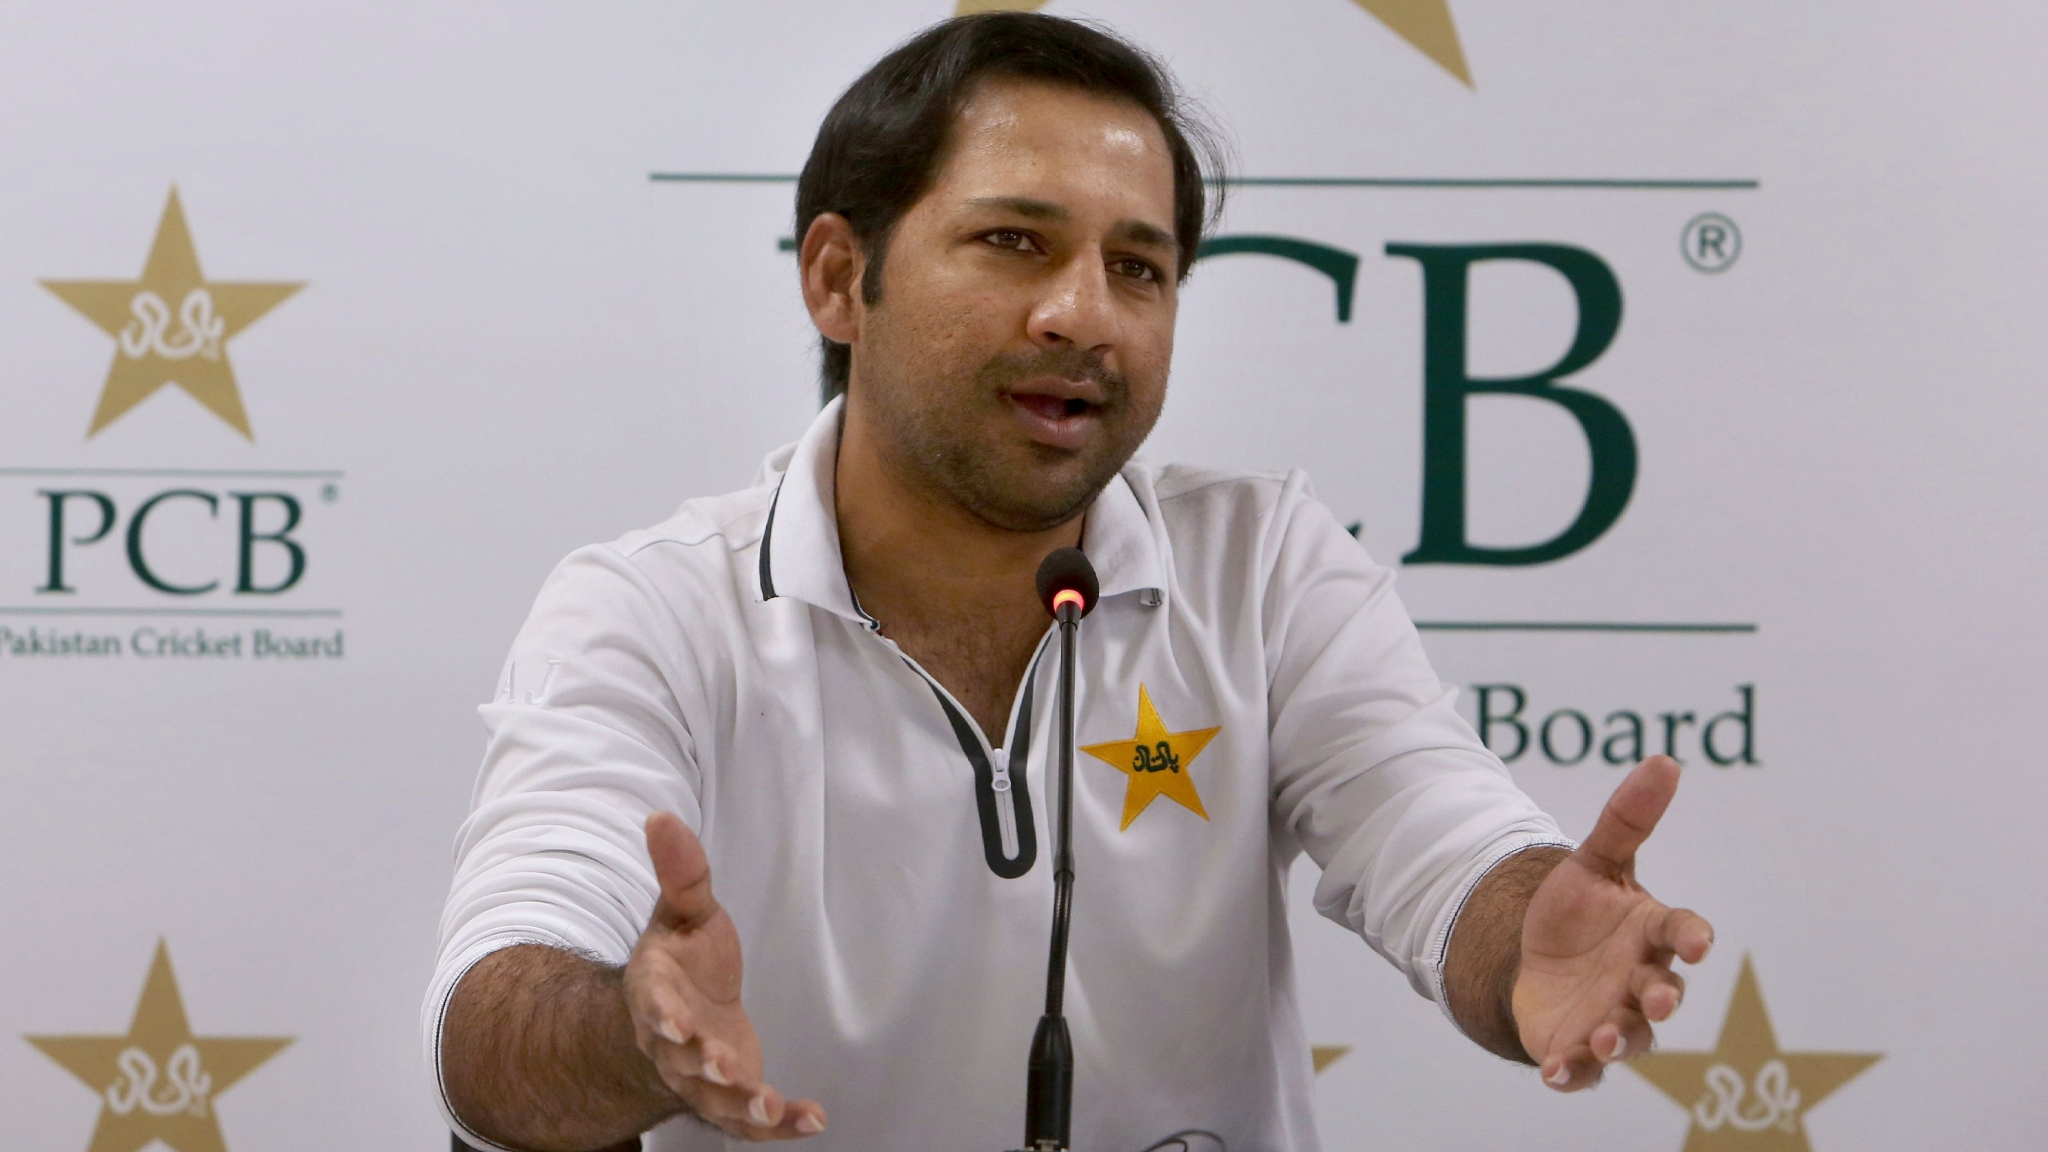 Inshallah They'll Come: Pak Captain Sarfaraz Pins Hopes on SL